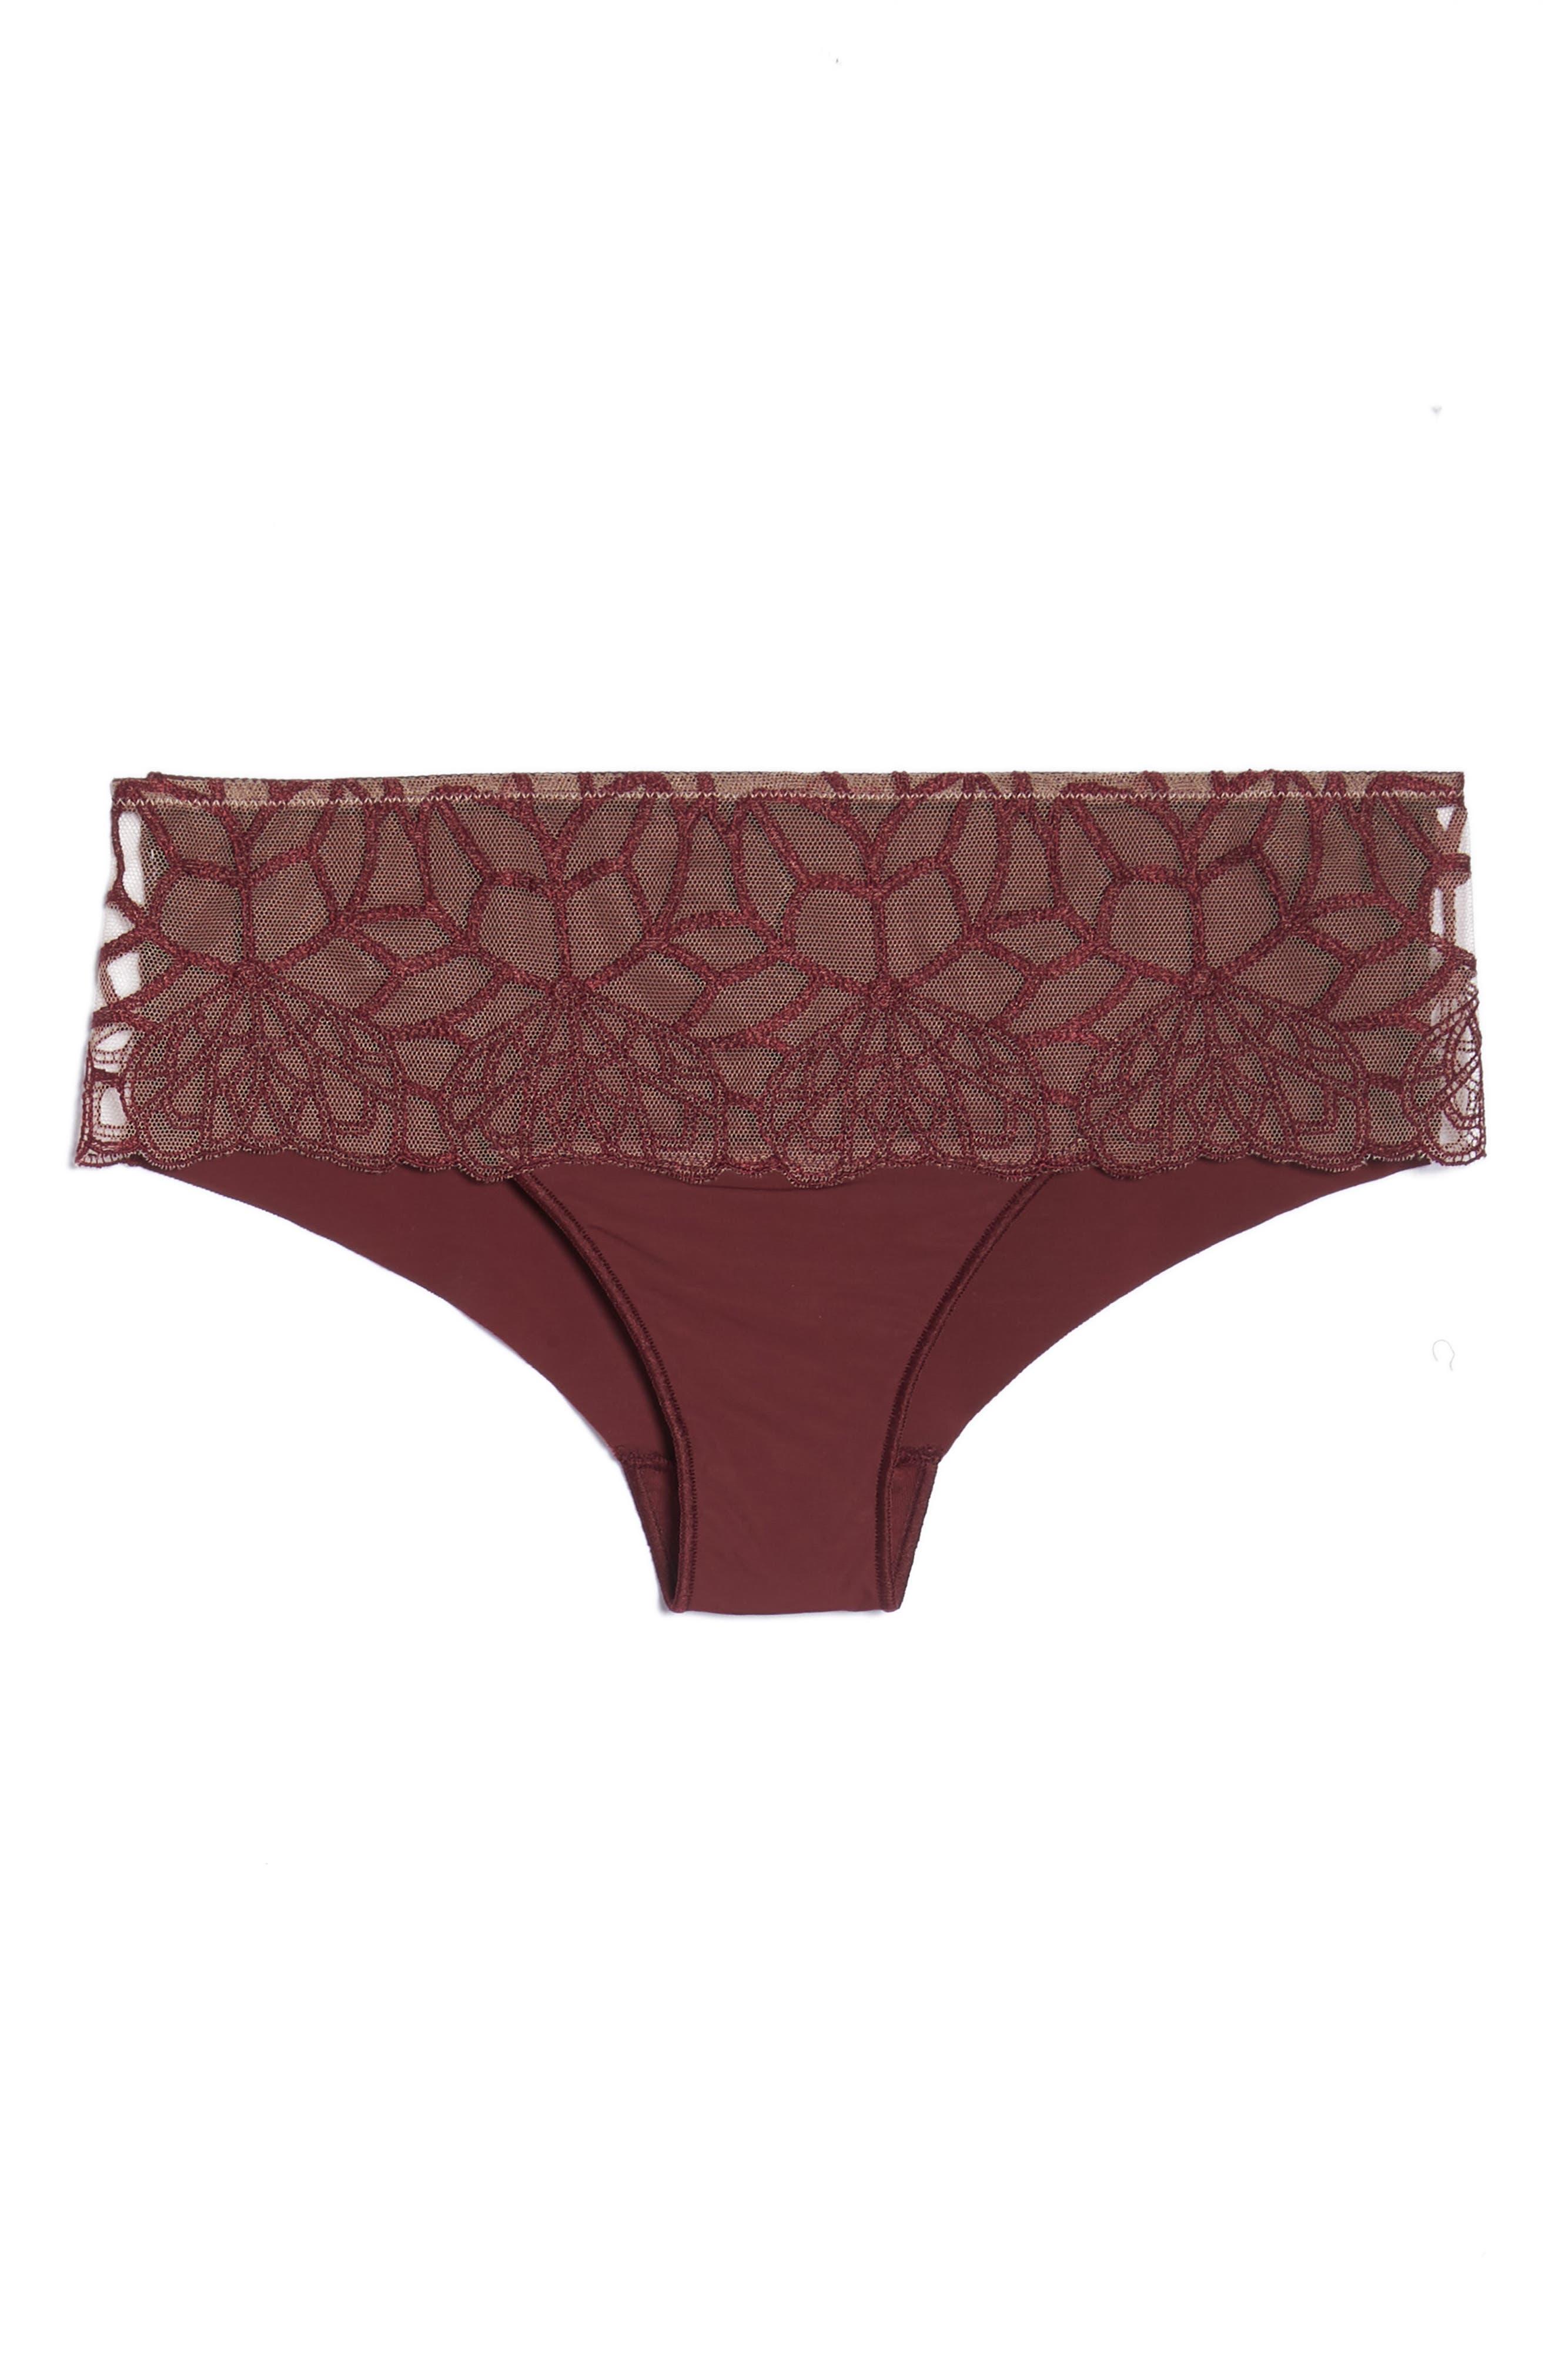 Java Hipster Panties,                             Alternate thumbnail 6, color,                             HENNA